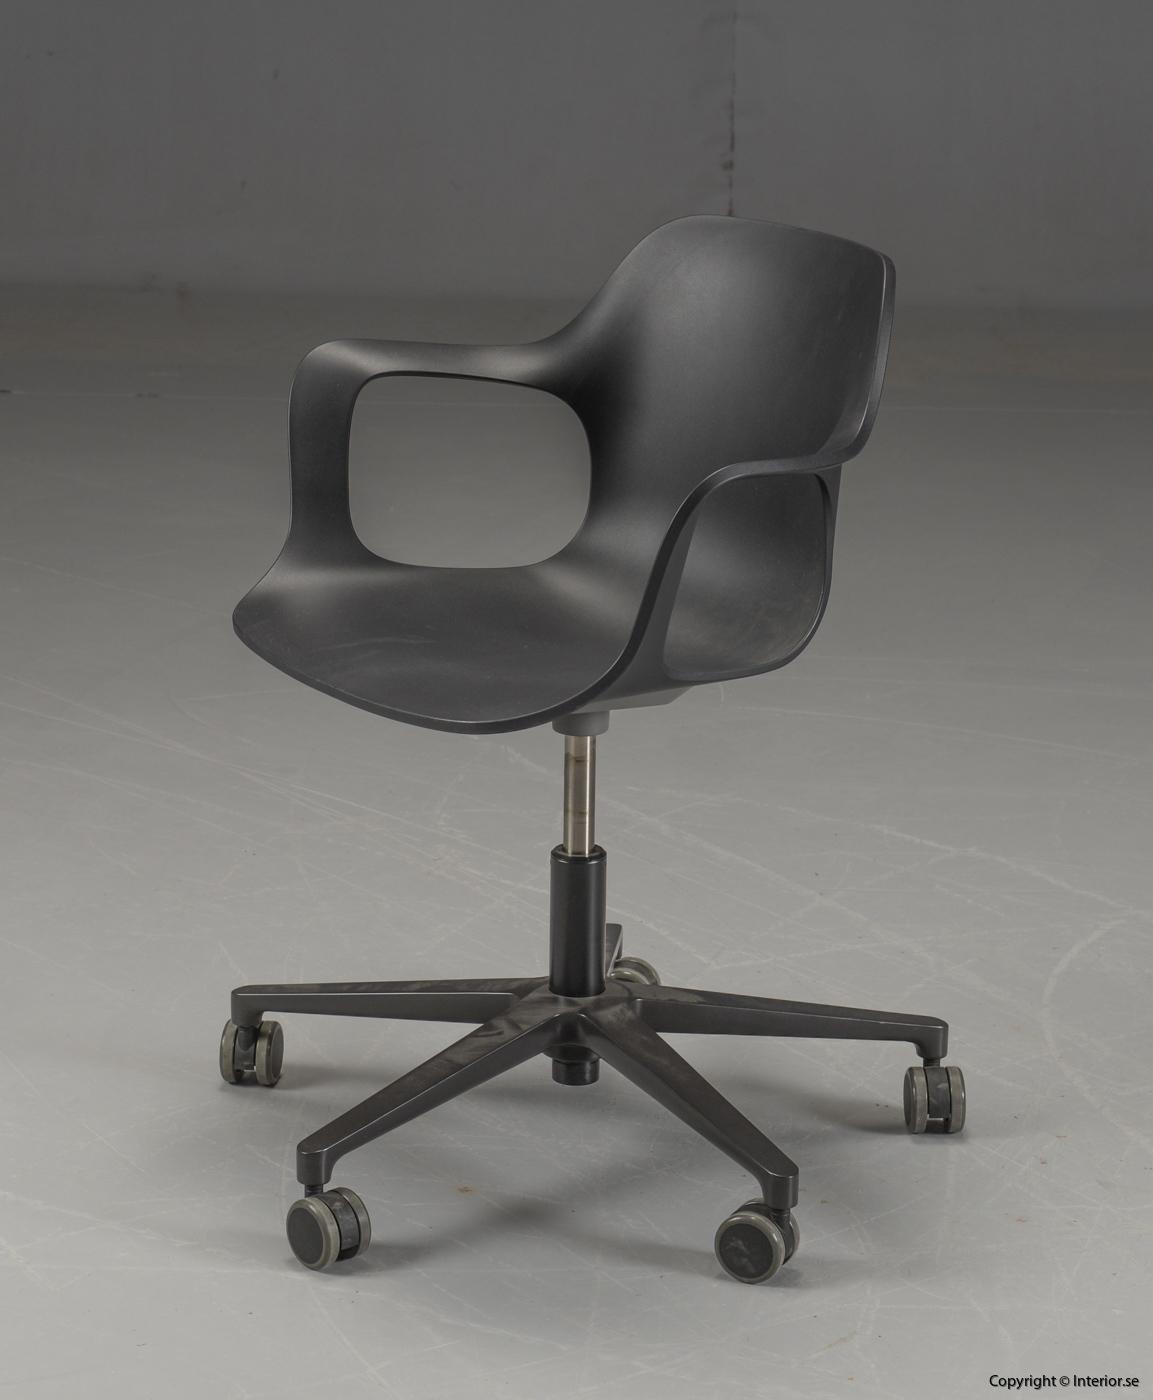 Kontorsstol Bureaustoel Bürostuhl Vitra HAL Armchair Studio - Jasper Morrison